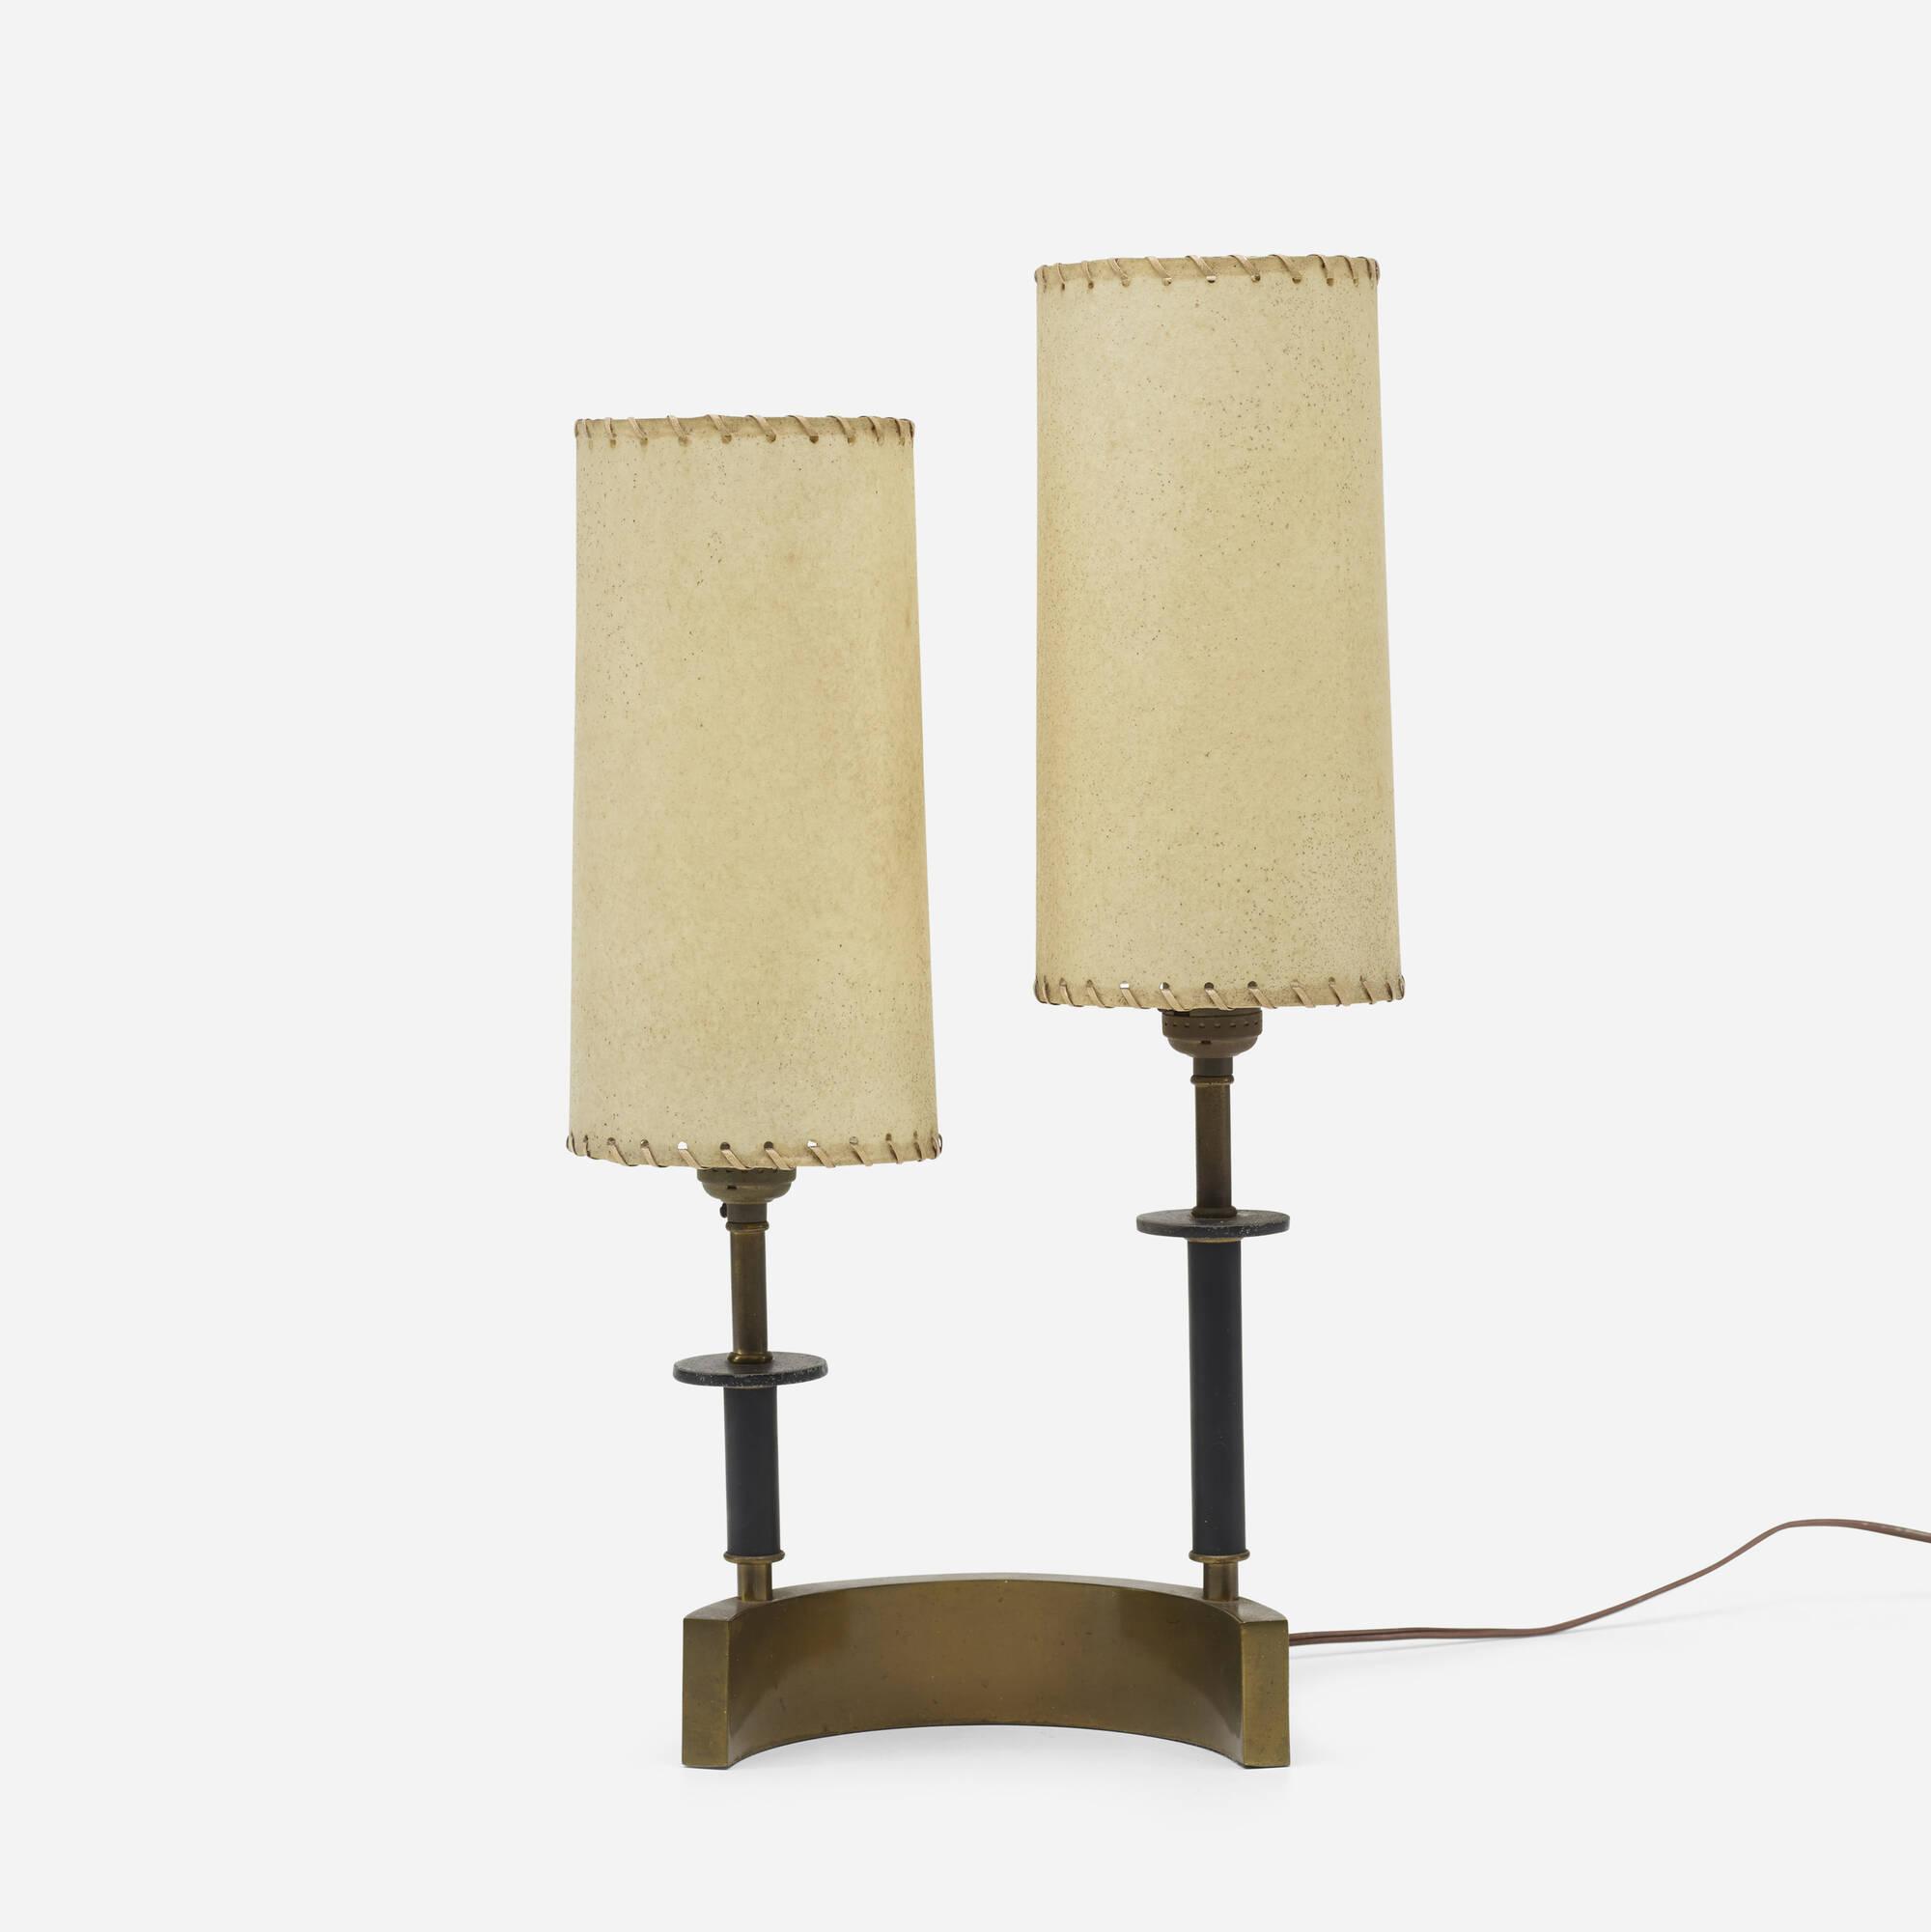 610: Modernist / table lamp (1 of 1)